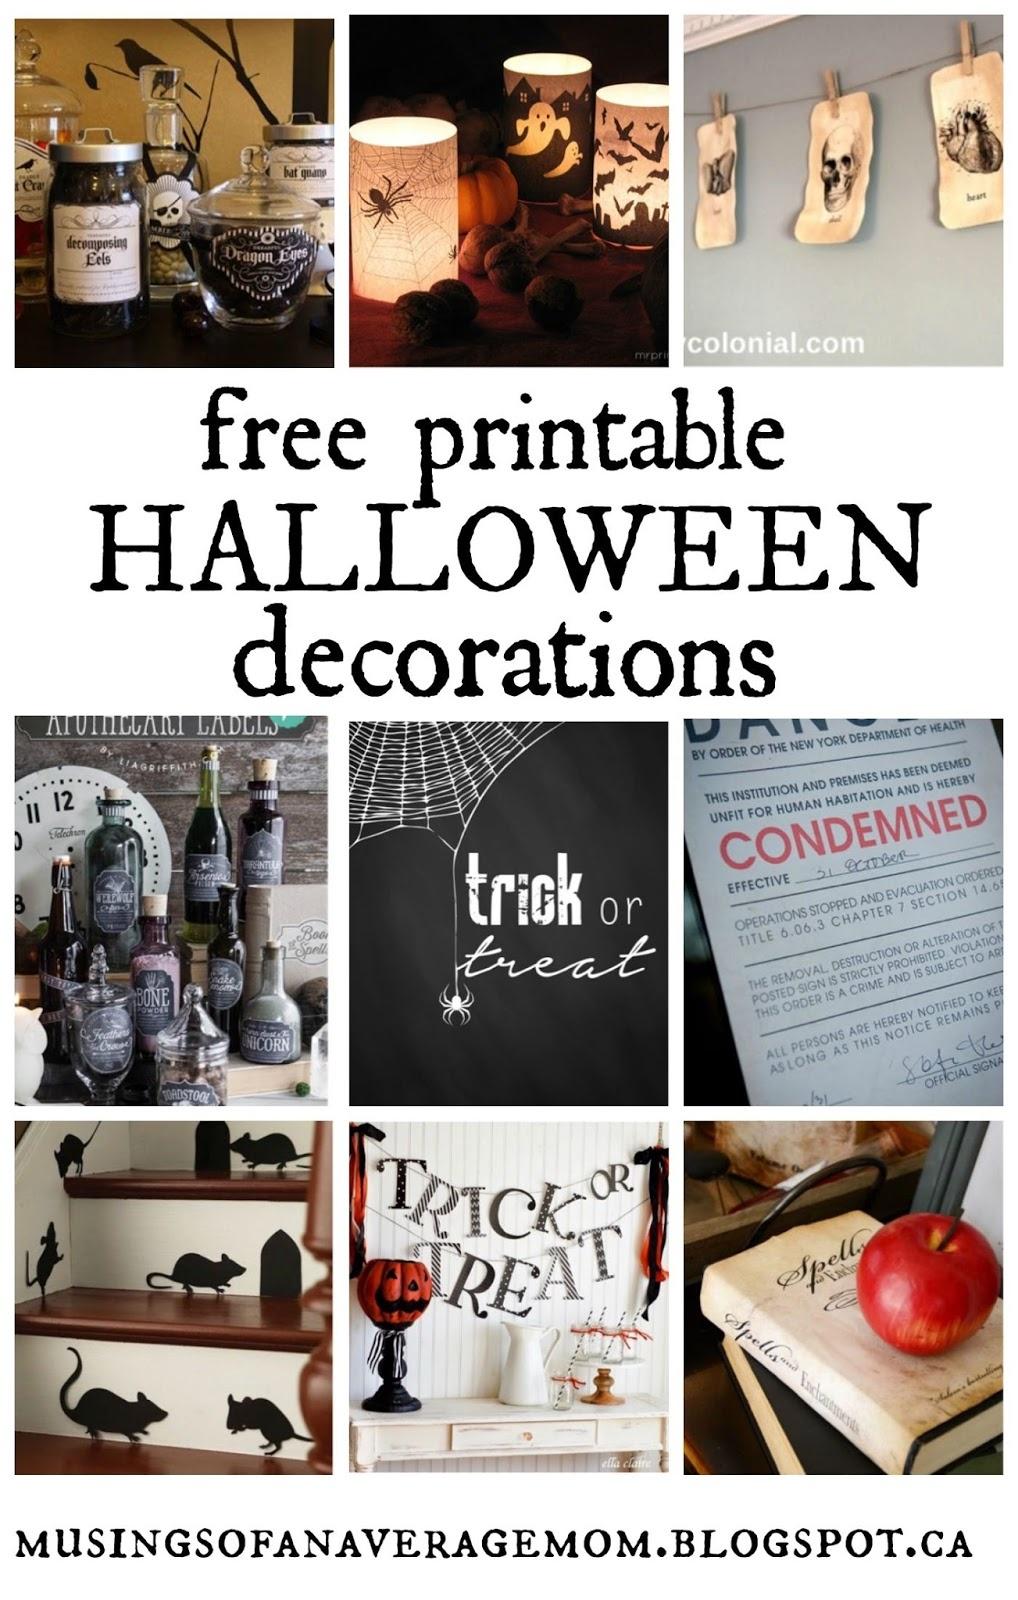 Musings Of An Average Mom: Free Printable Halloween Decorations - Free Printable Halloween Decorations